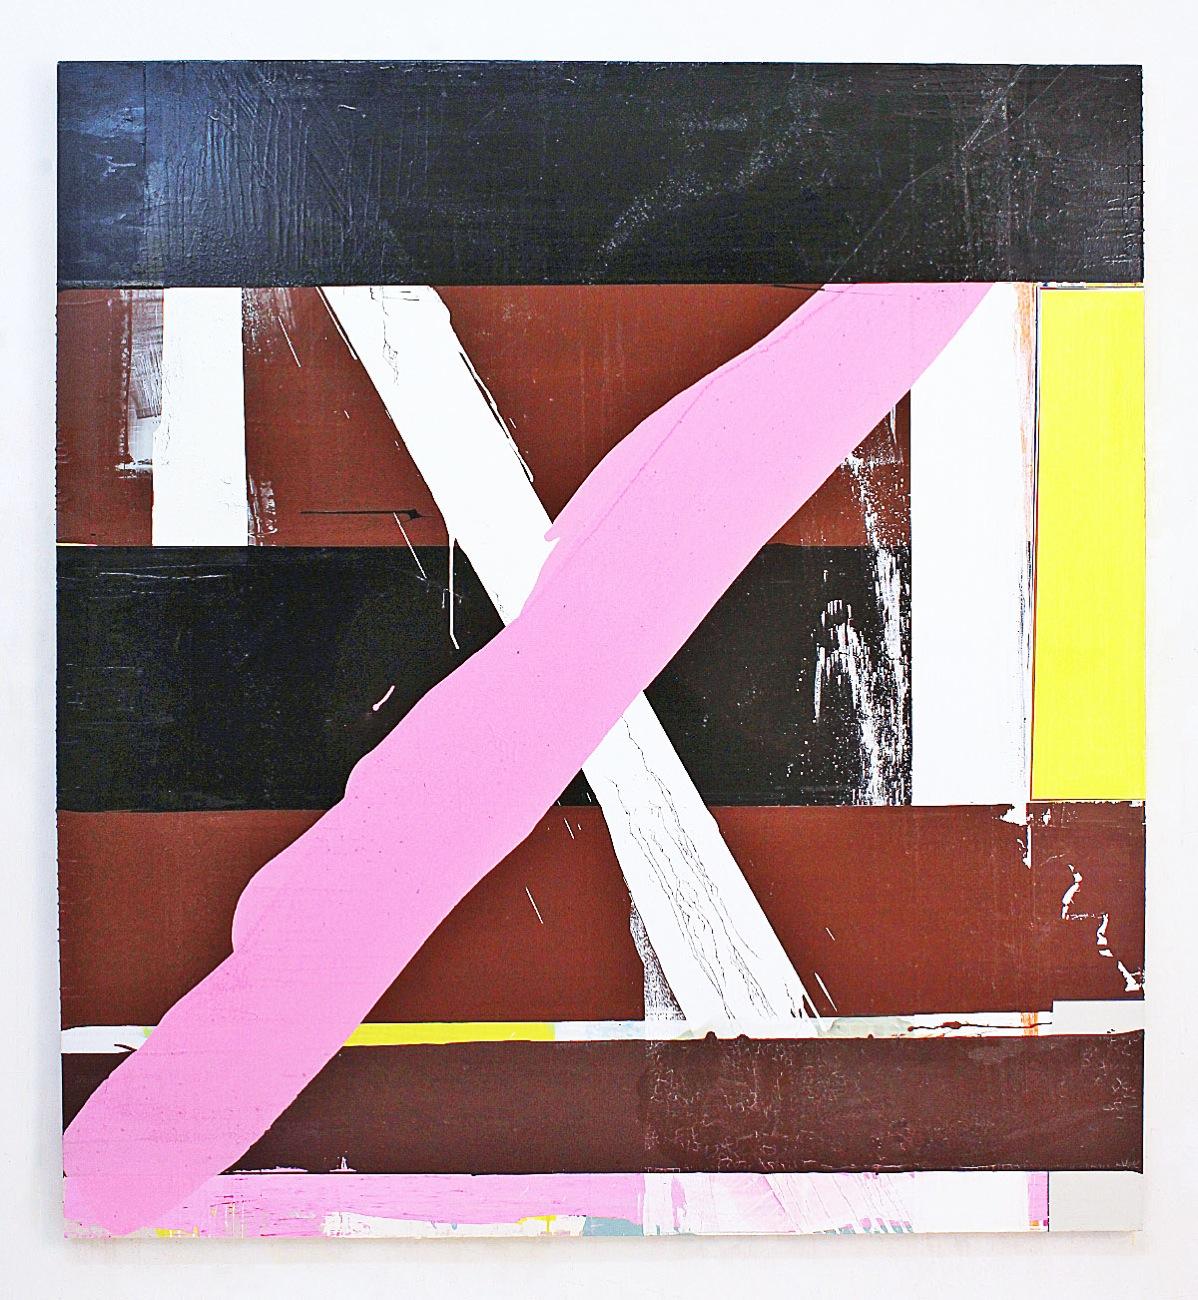 """In Between"", 200x200 cm, Acrylfarbe, Leinwand, 2003"